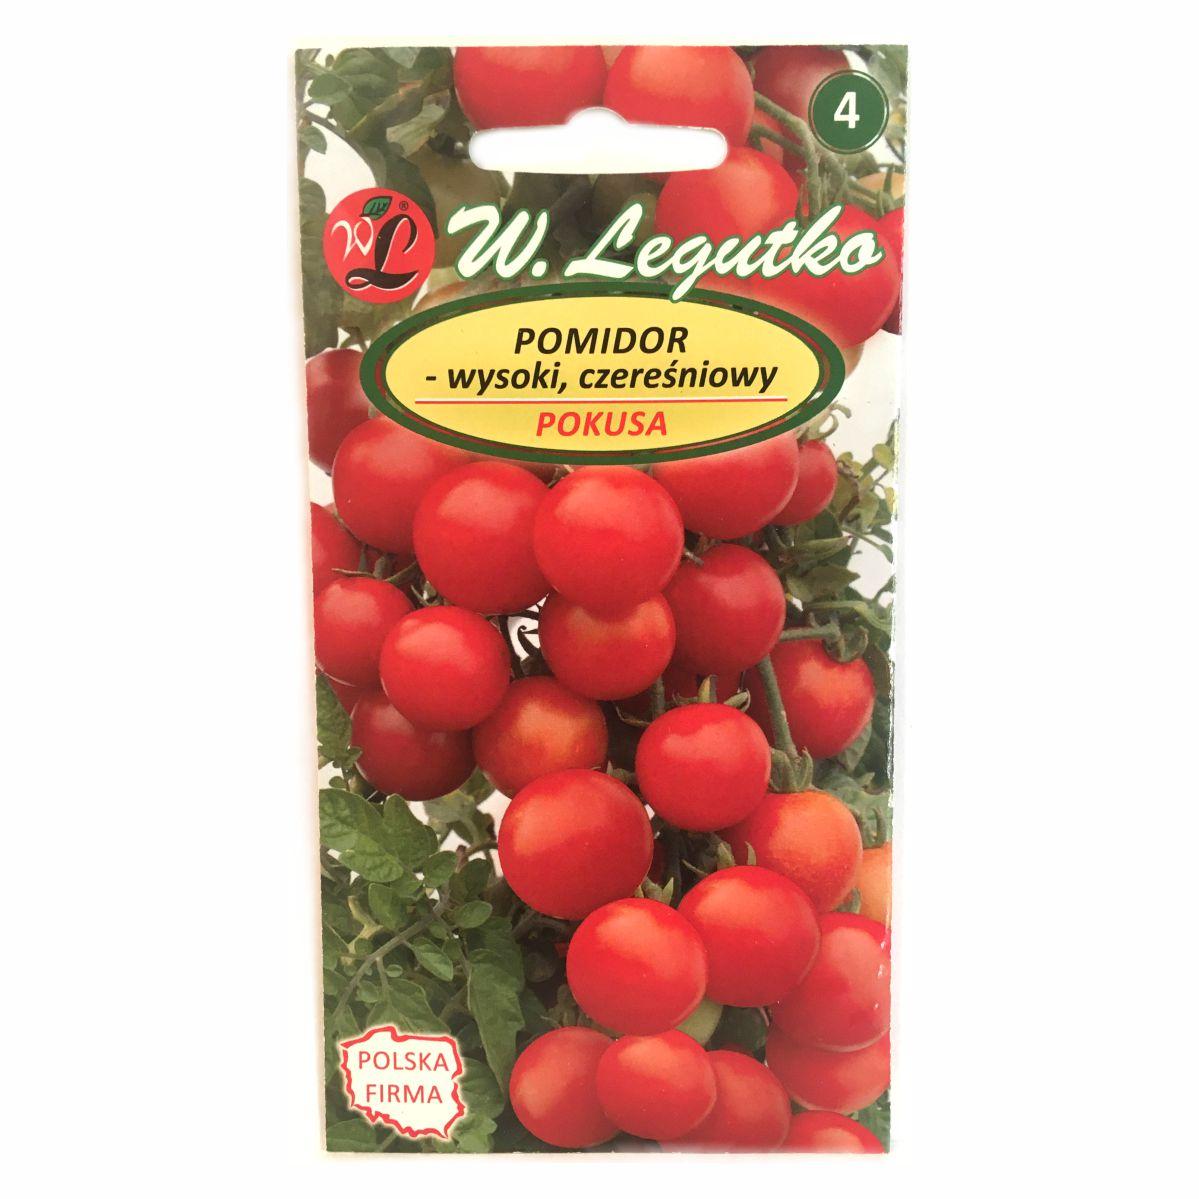 Pomidor Pokusa nasiona Legutko